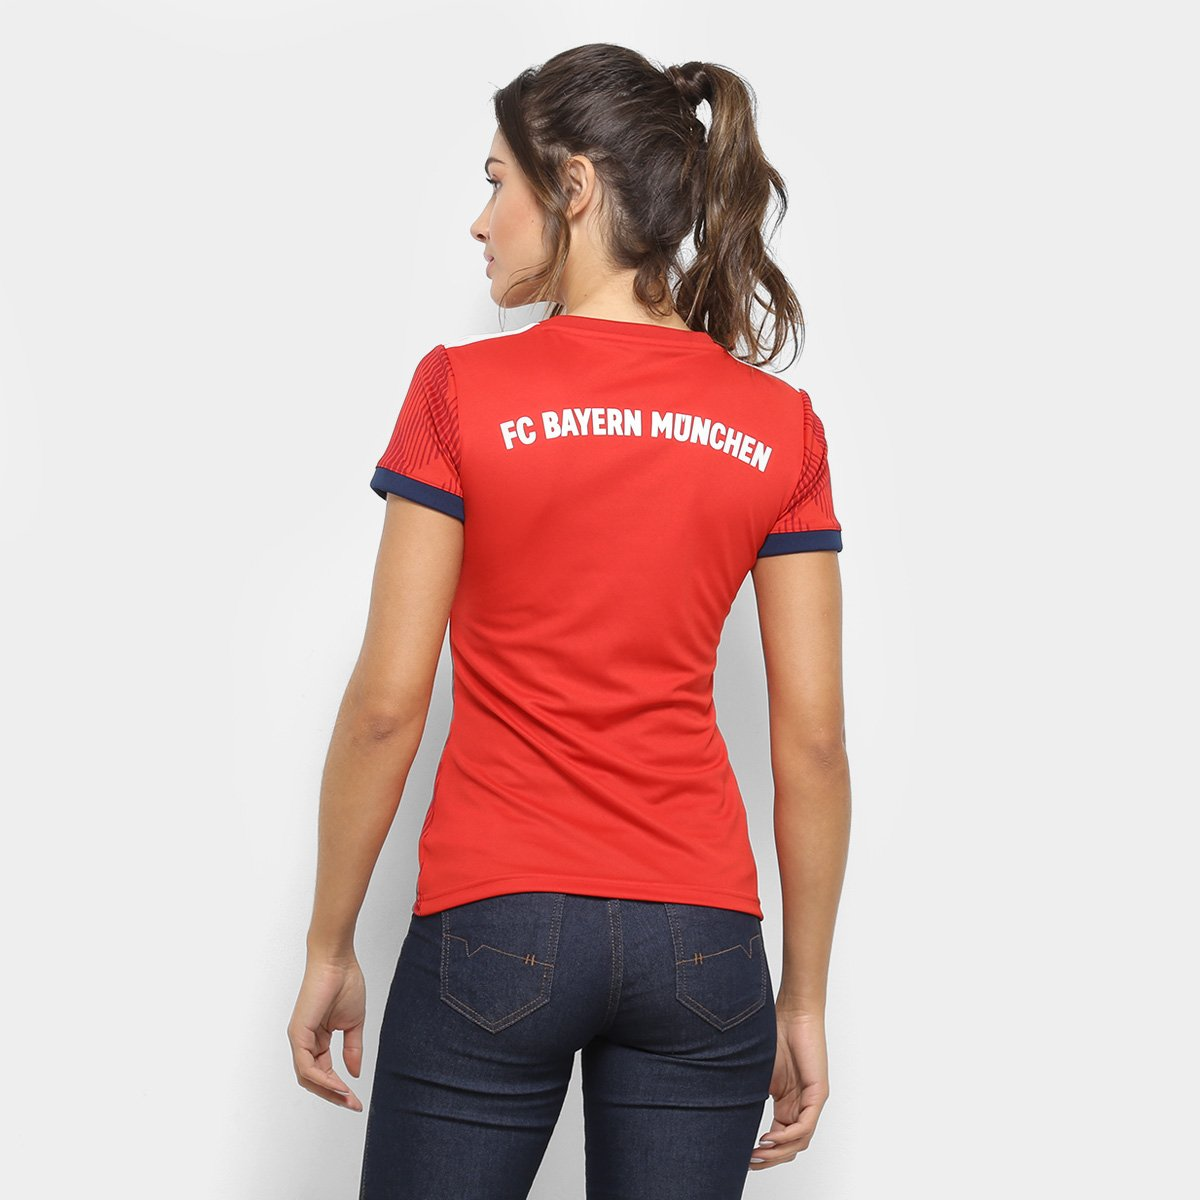 126e48a87e Camisa Bayern de Munique Home 2018 s/n° - Torcedor Adidas Feminina ...